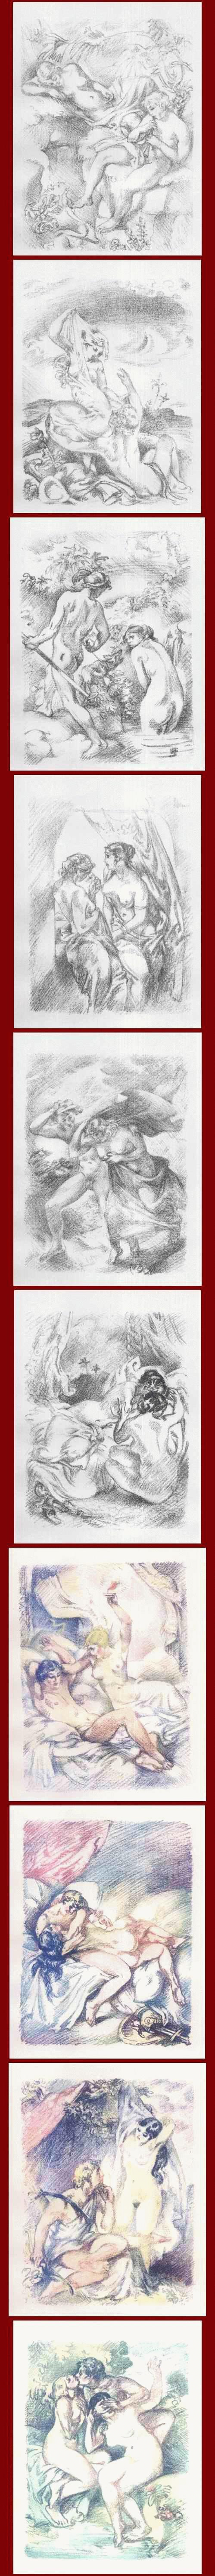 Bernhard Hasler - Die INDISCHE HARFE - 10 erotische Original-Lithographien des ORLIK u. CORINTH-Schülers - 1913 kopen? Bied vanaf 210!